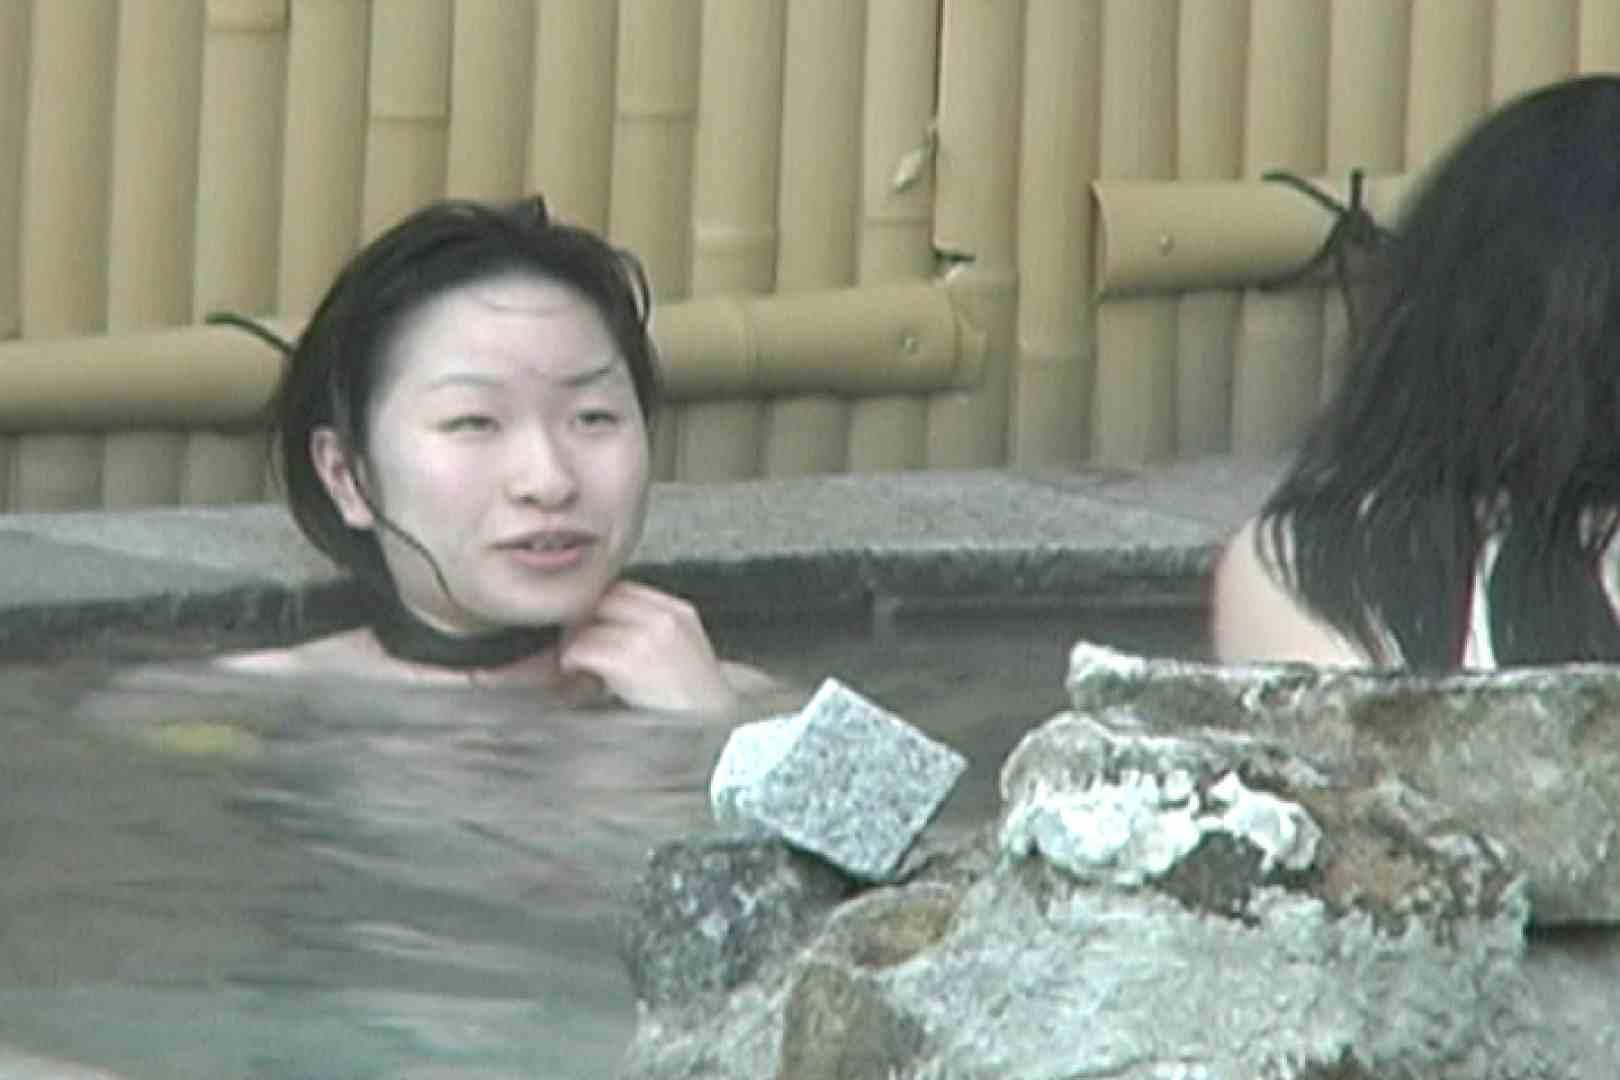 Aquaな露天風呂Vol.595 0 | 0  89連発 75